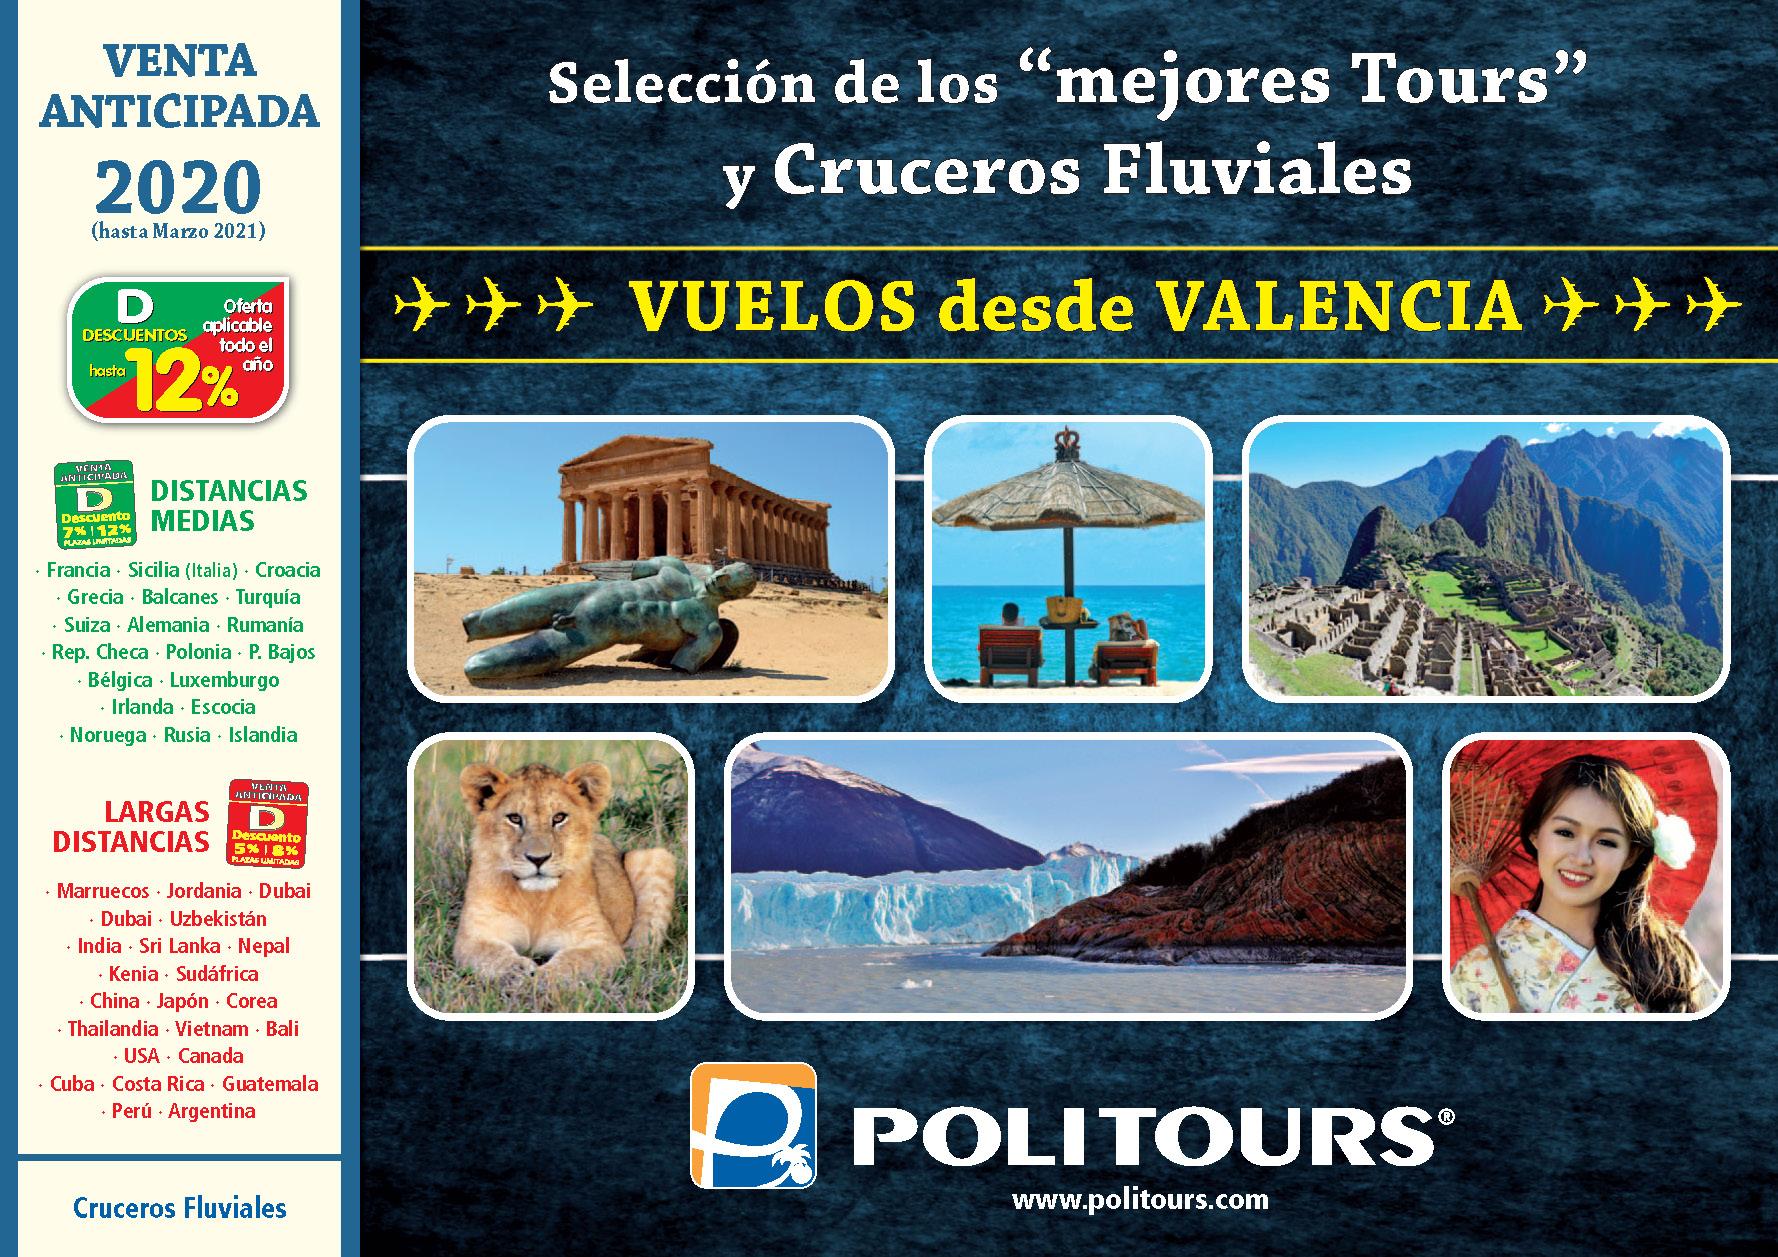 Catalogo Politours Venta Anticipada 2020 salidas Valencia